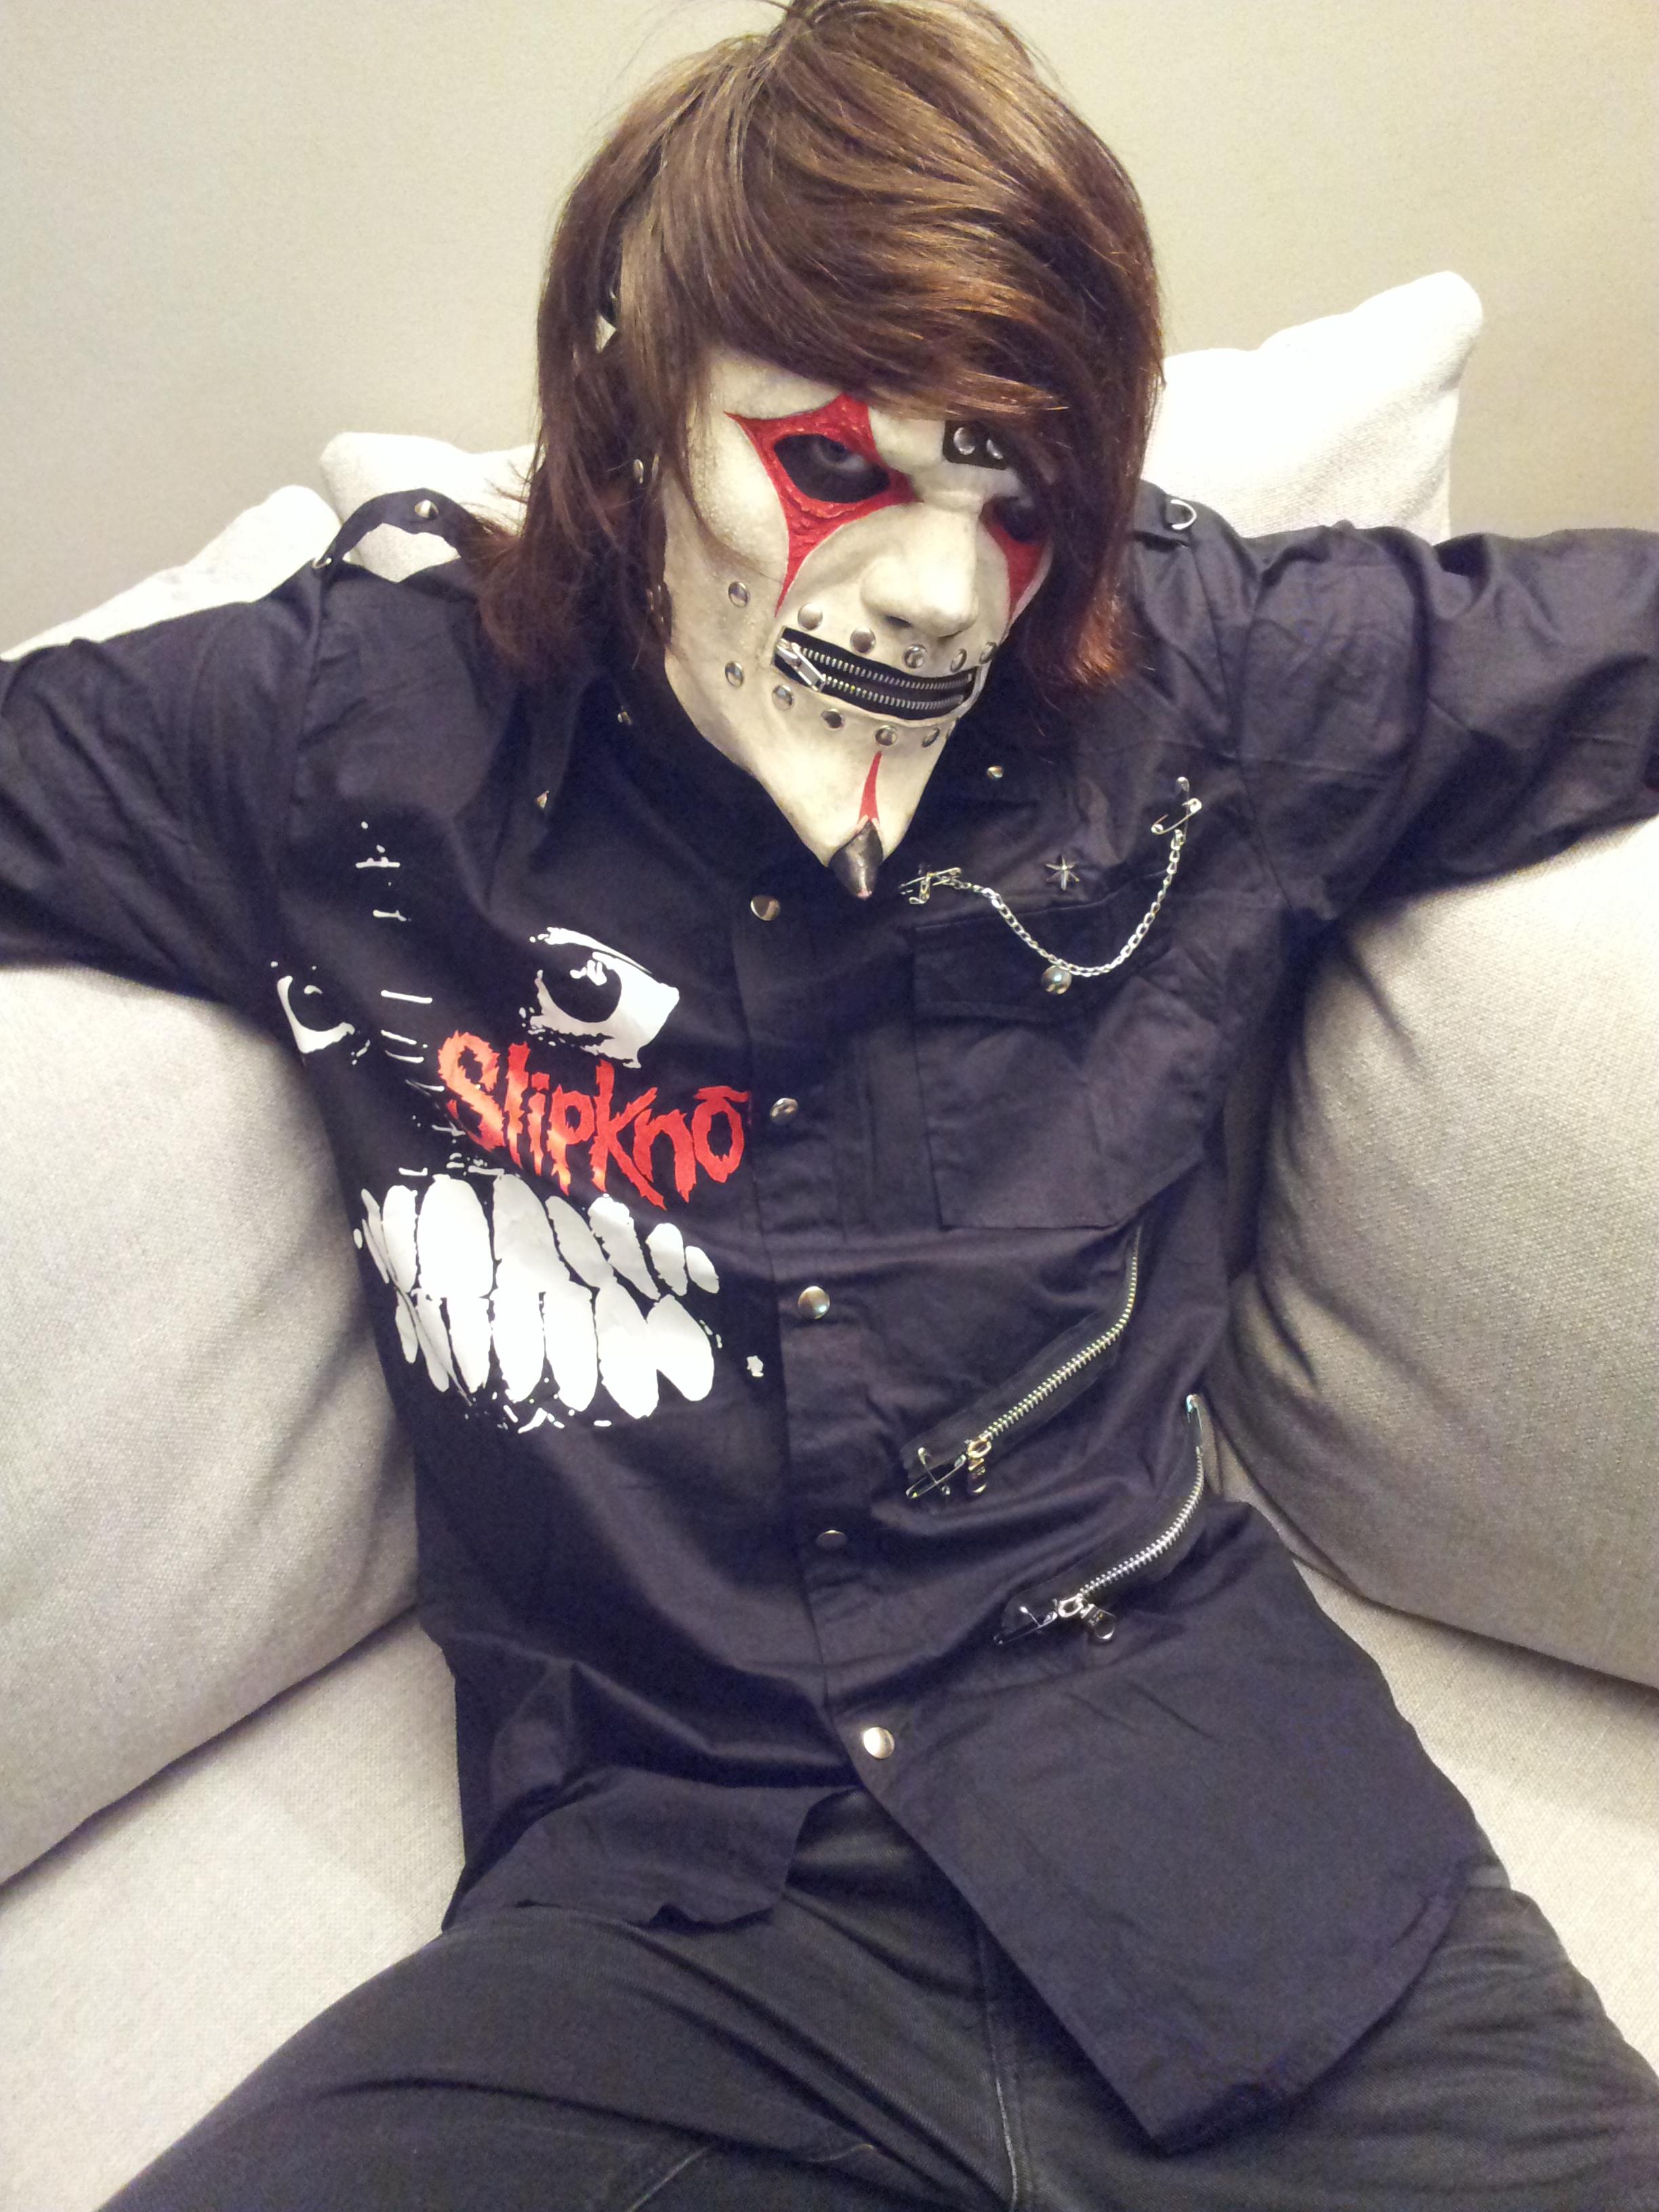 Slipknot Jim Root Cosplay by Hexalot on DeviantArt